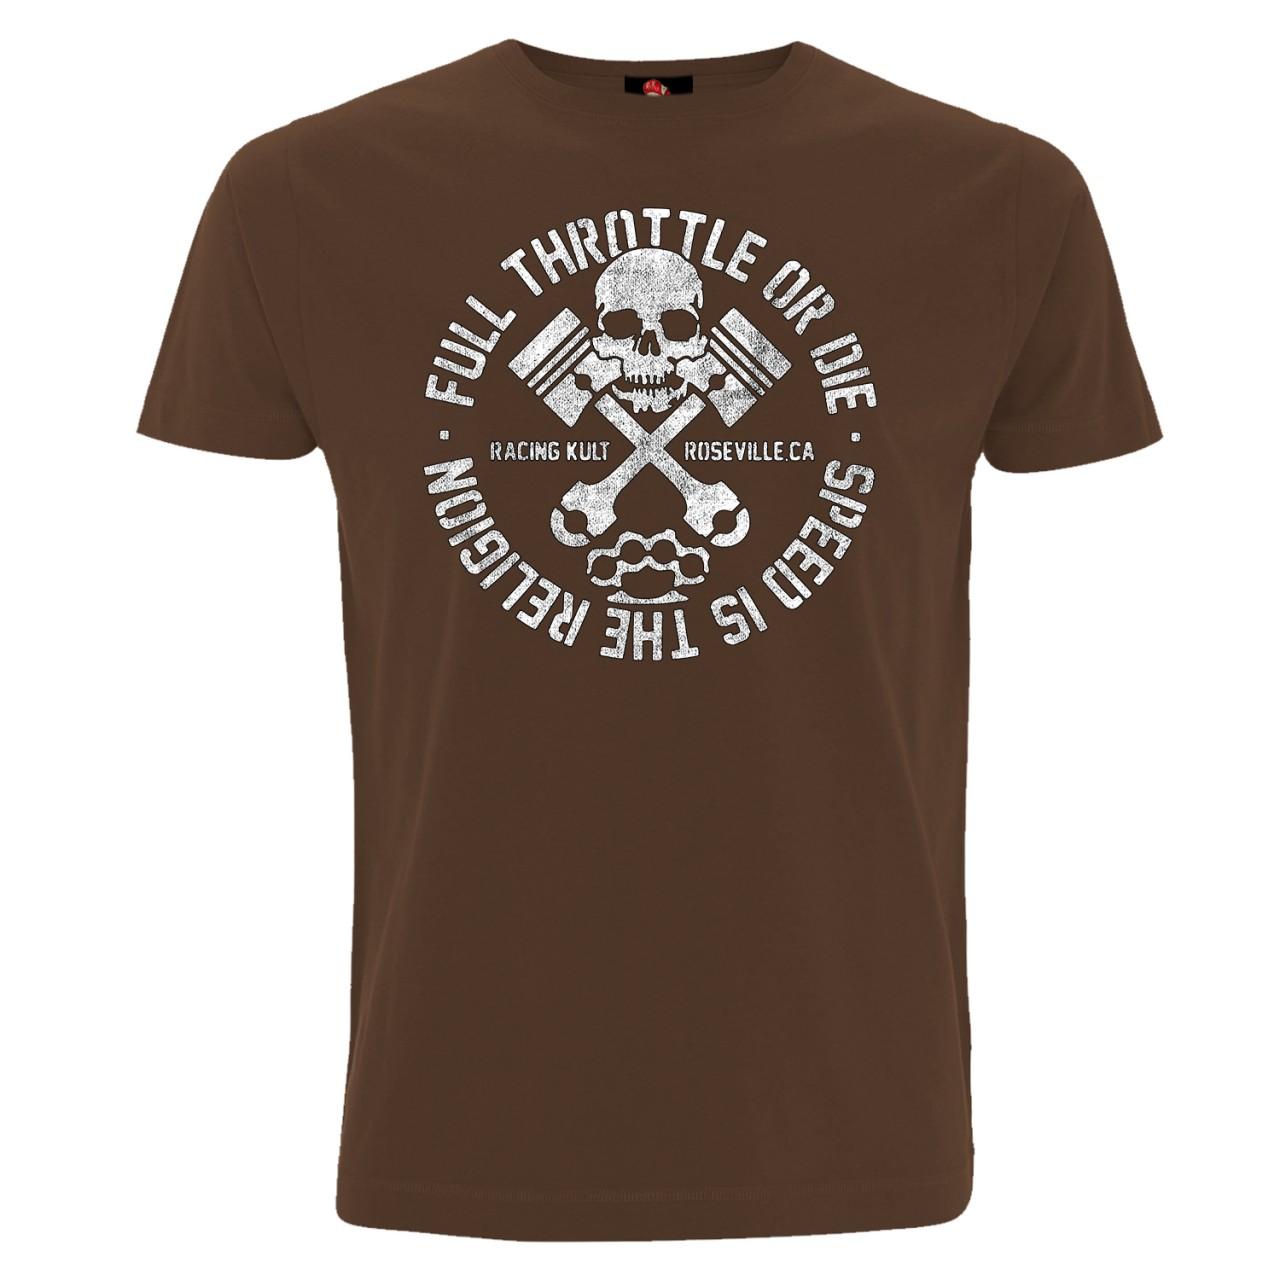 Racing Kult T-Shirt Full Throttle Frontprint Motiv in Weiß